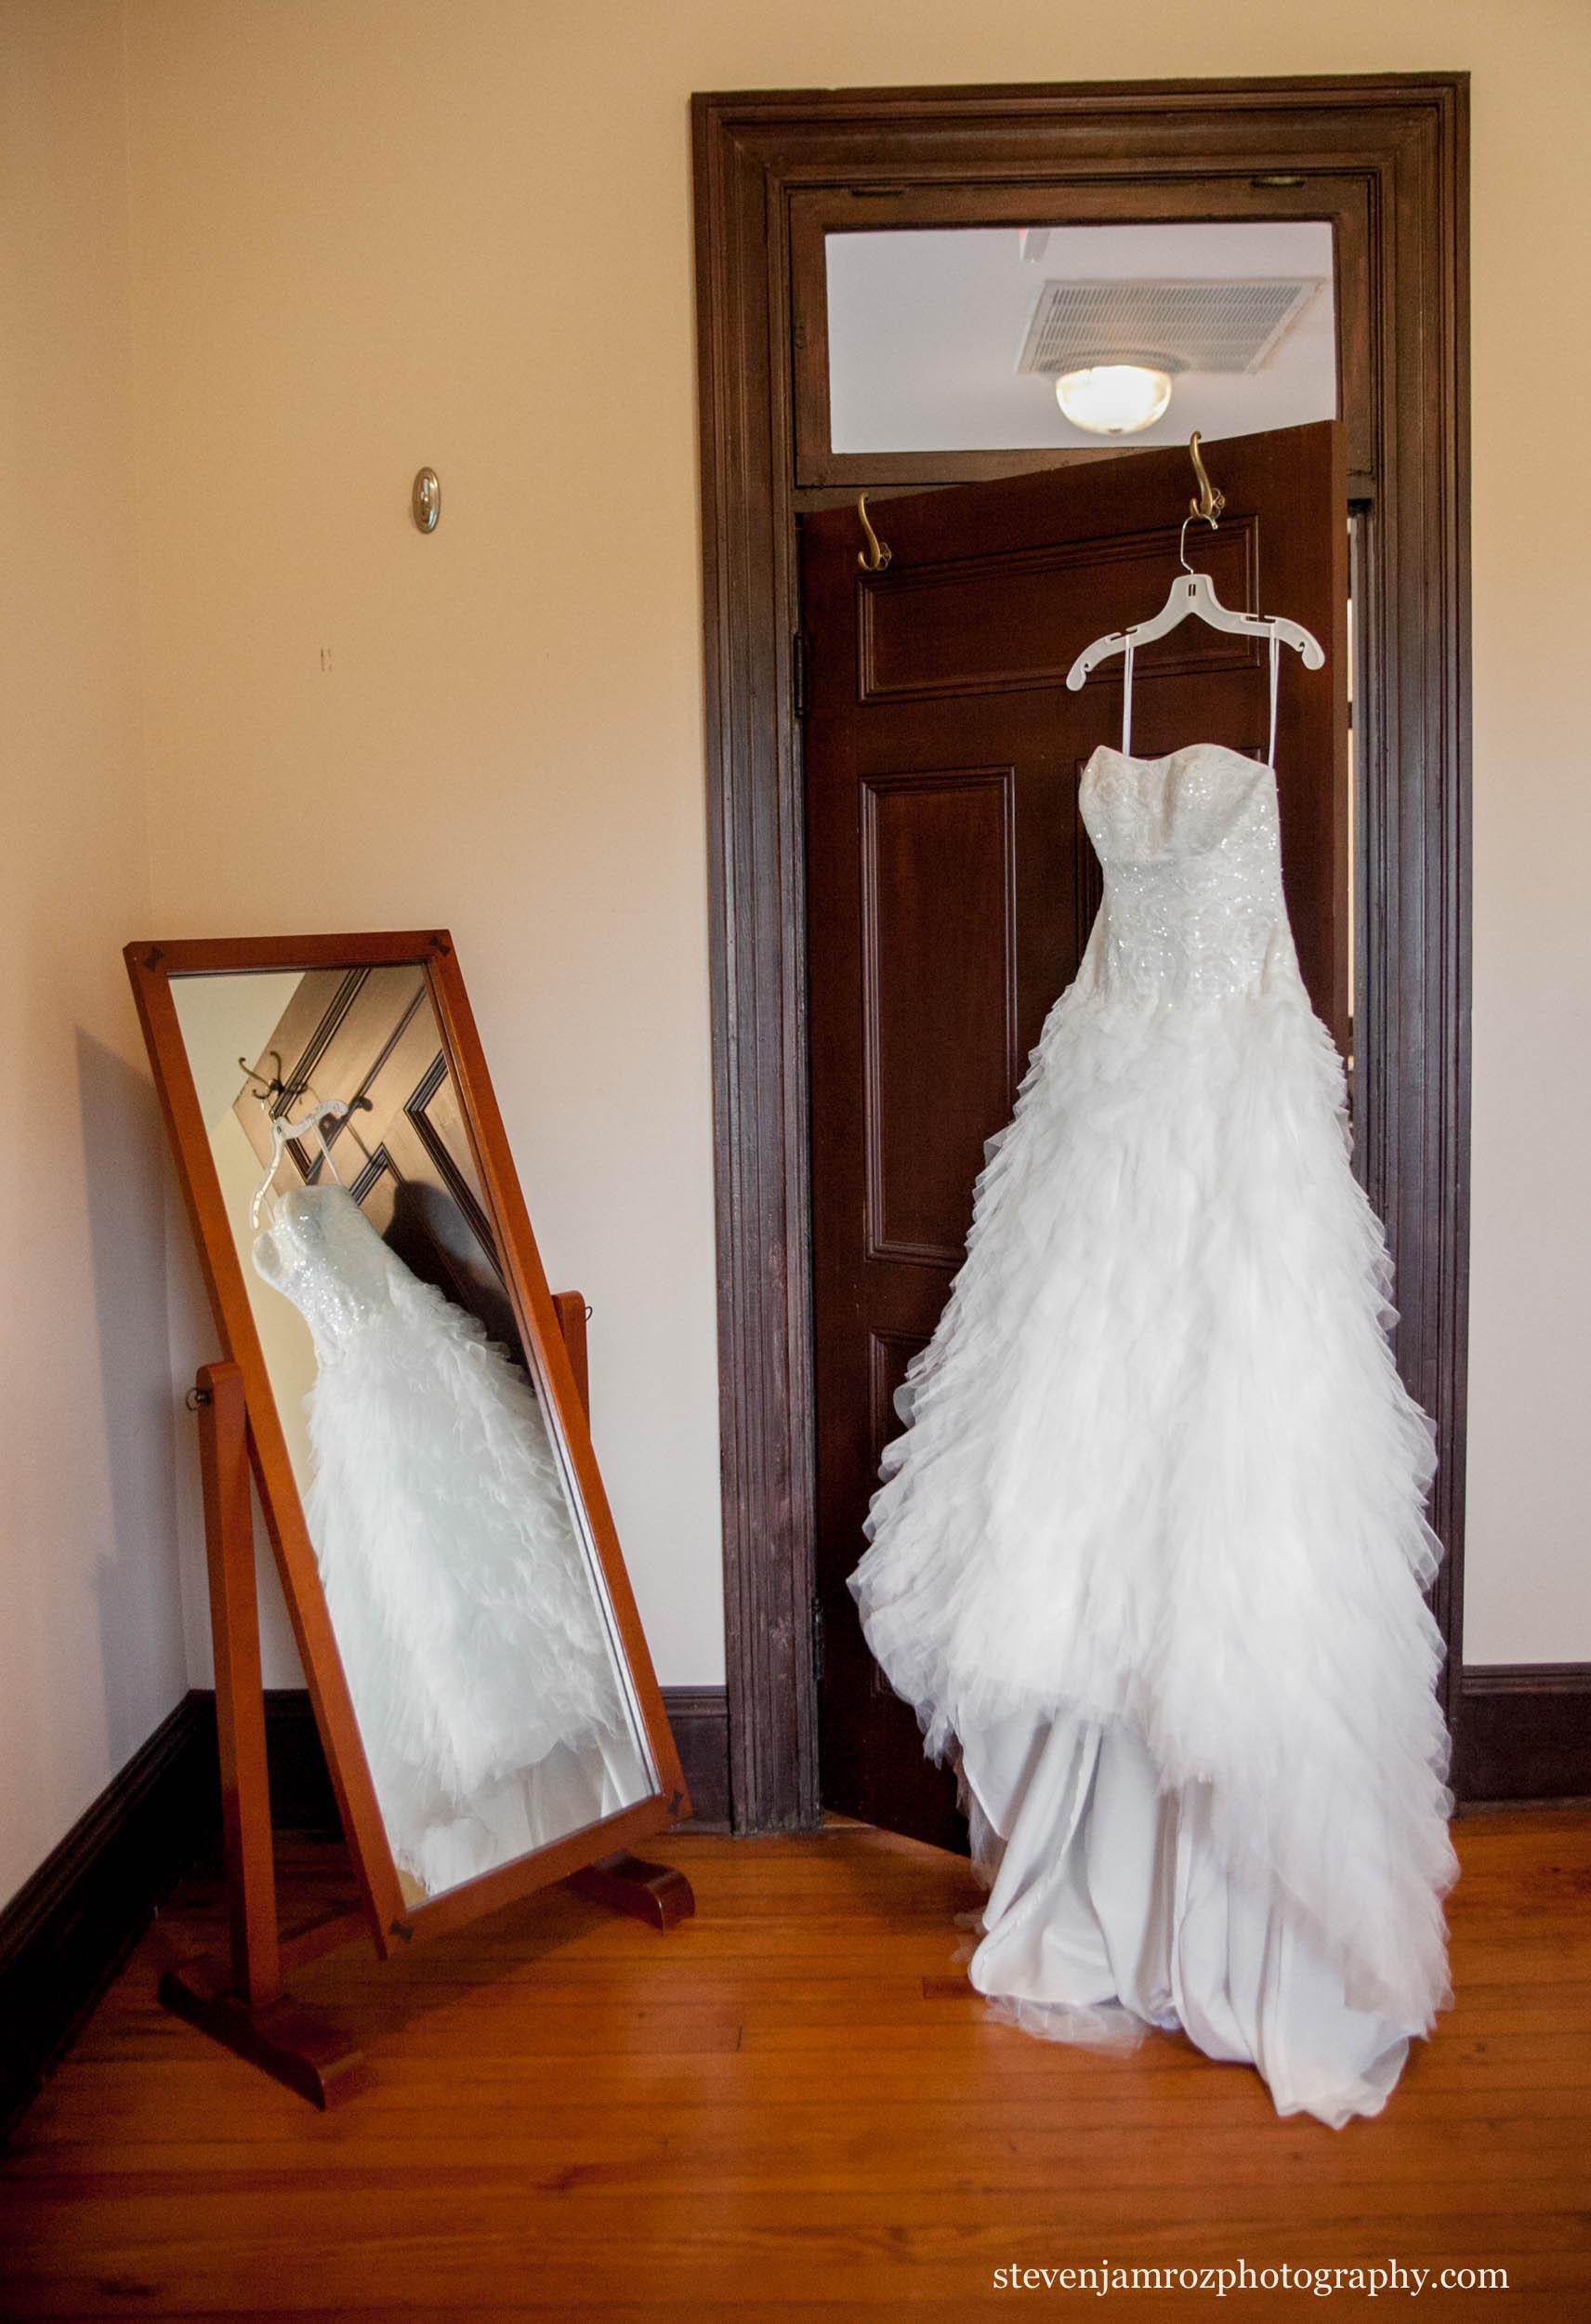 hanging-dress-mirror-fred-fletcher-park-steven-jamroz-photography-0292.jpg